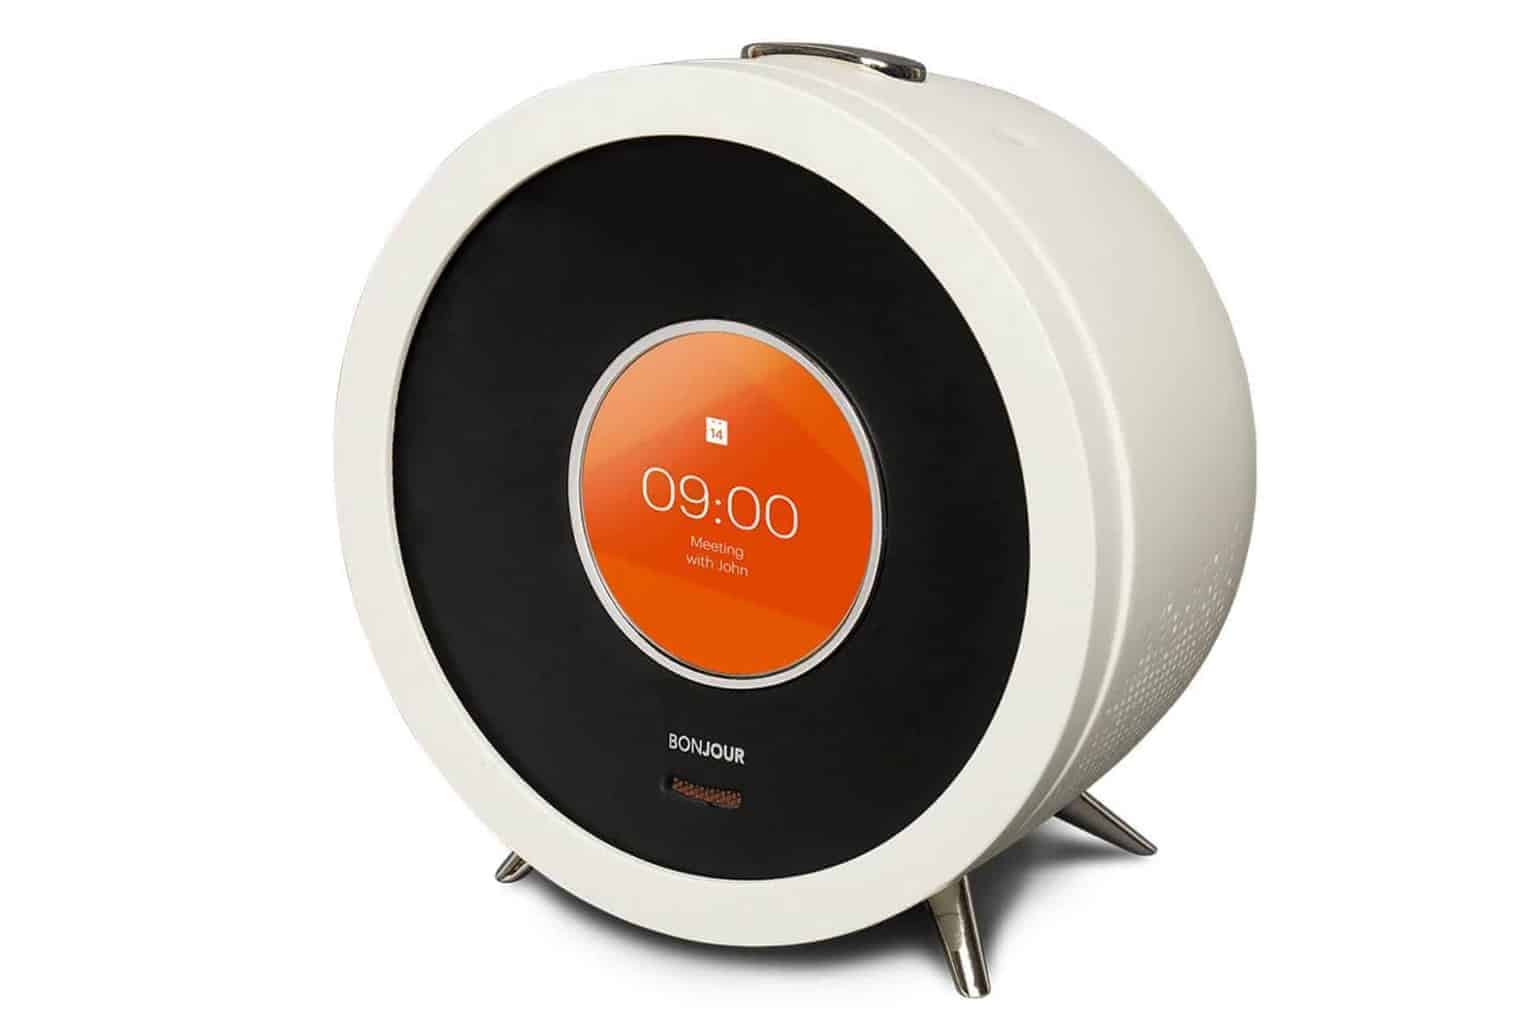 Bonjour Smart Alarm Clock The World S Smartest Alarm Clock Mantelligence